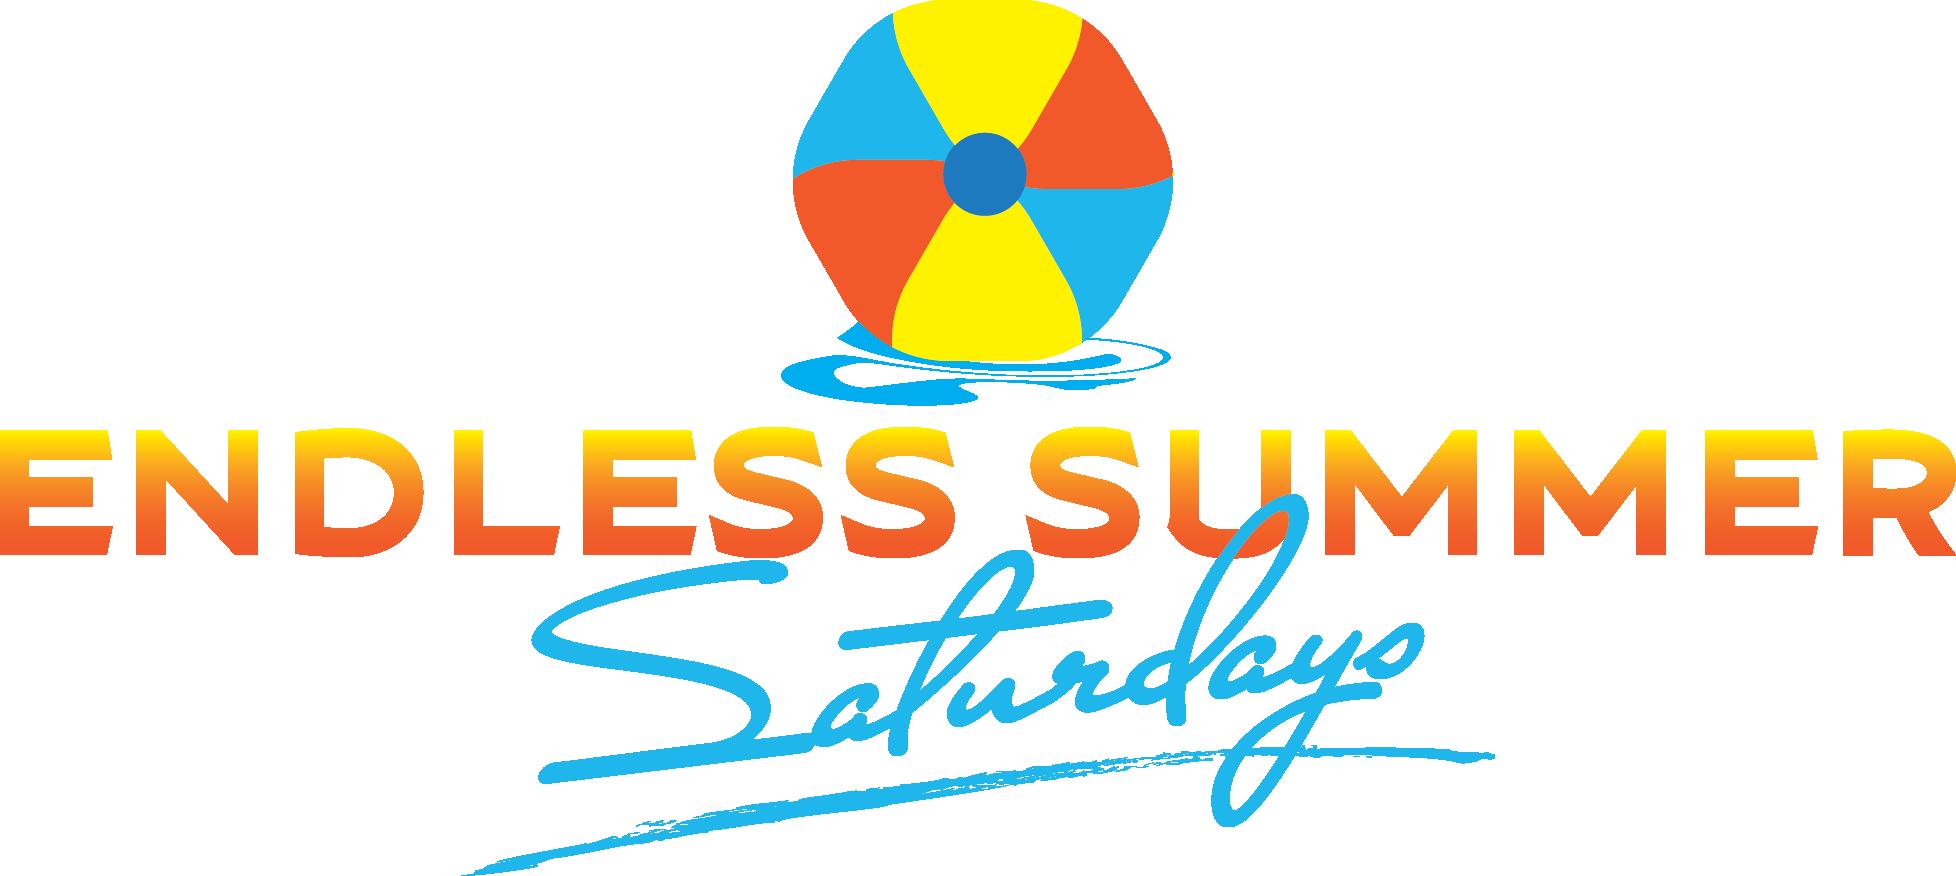 Endless Summer Saturdays.png